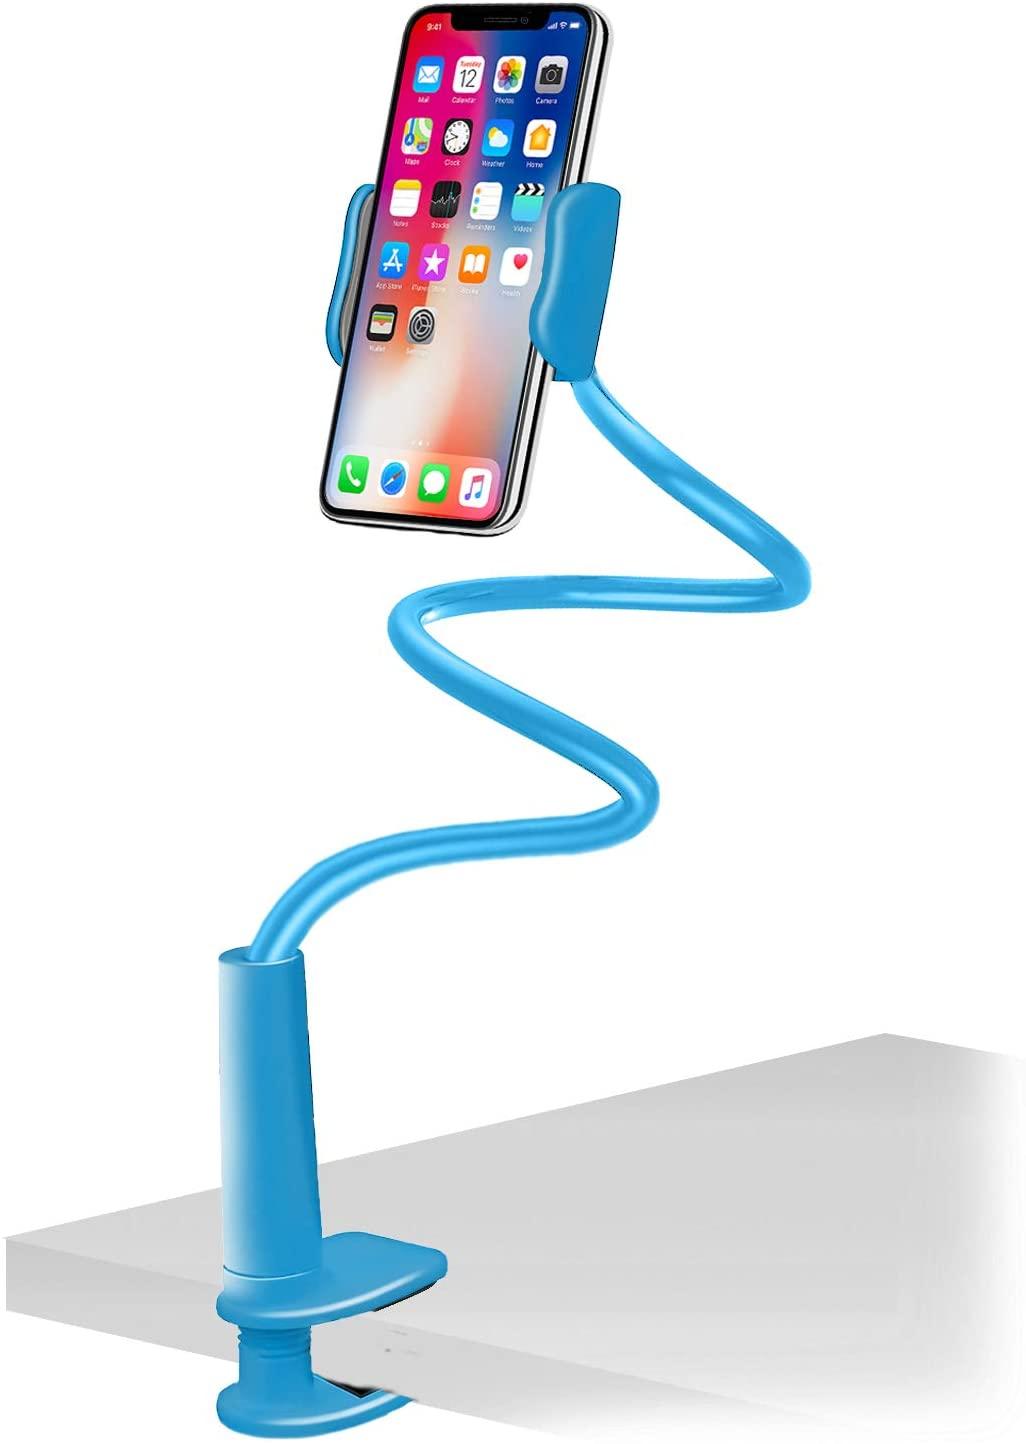 Aduro Solid-Grip Phone Holder for Desk - Adjustable Universal Gooseneck Smartphone Stand, with Durable Mount (Blue)